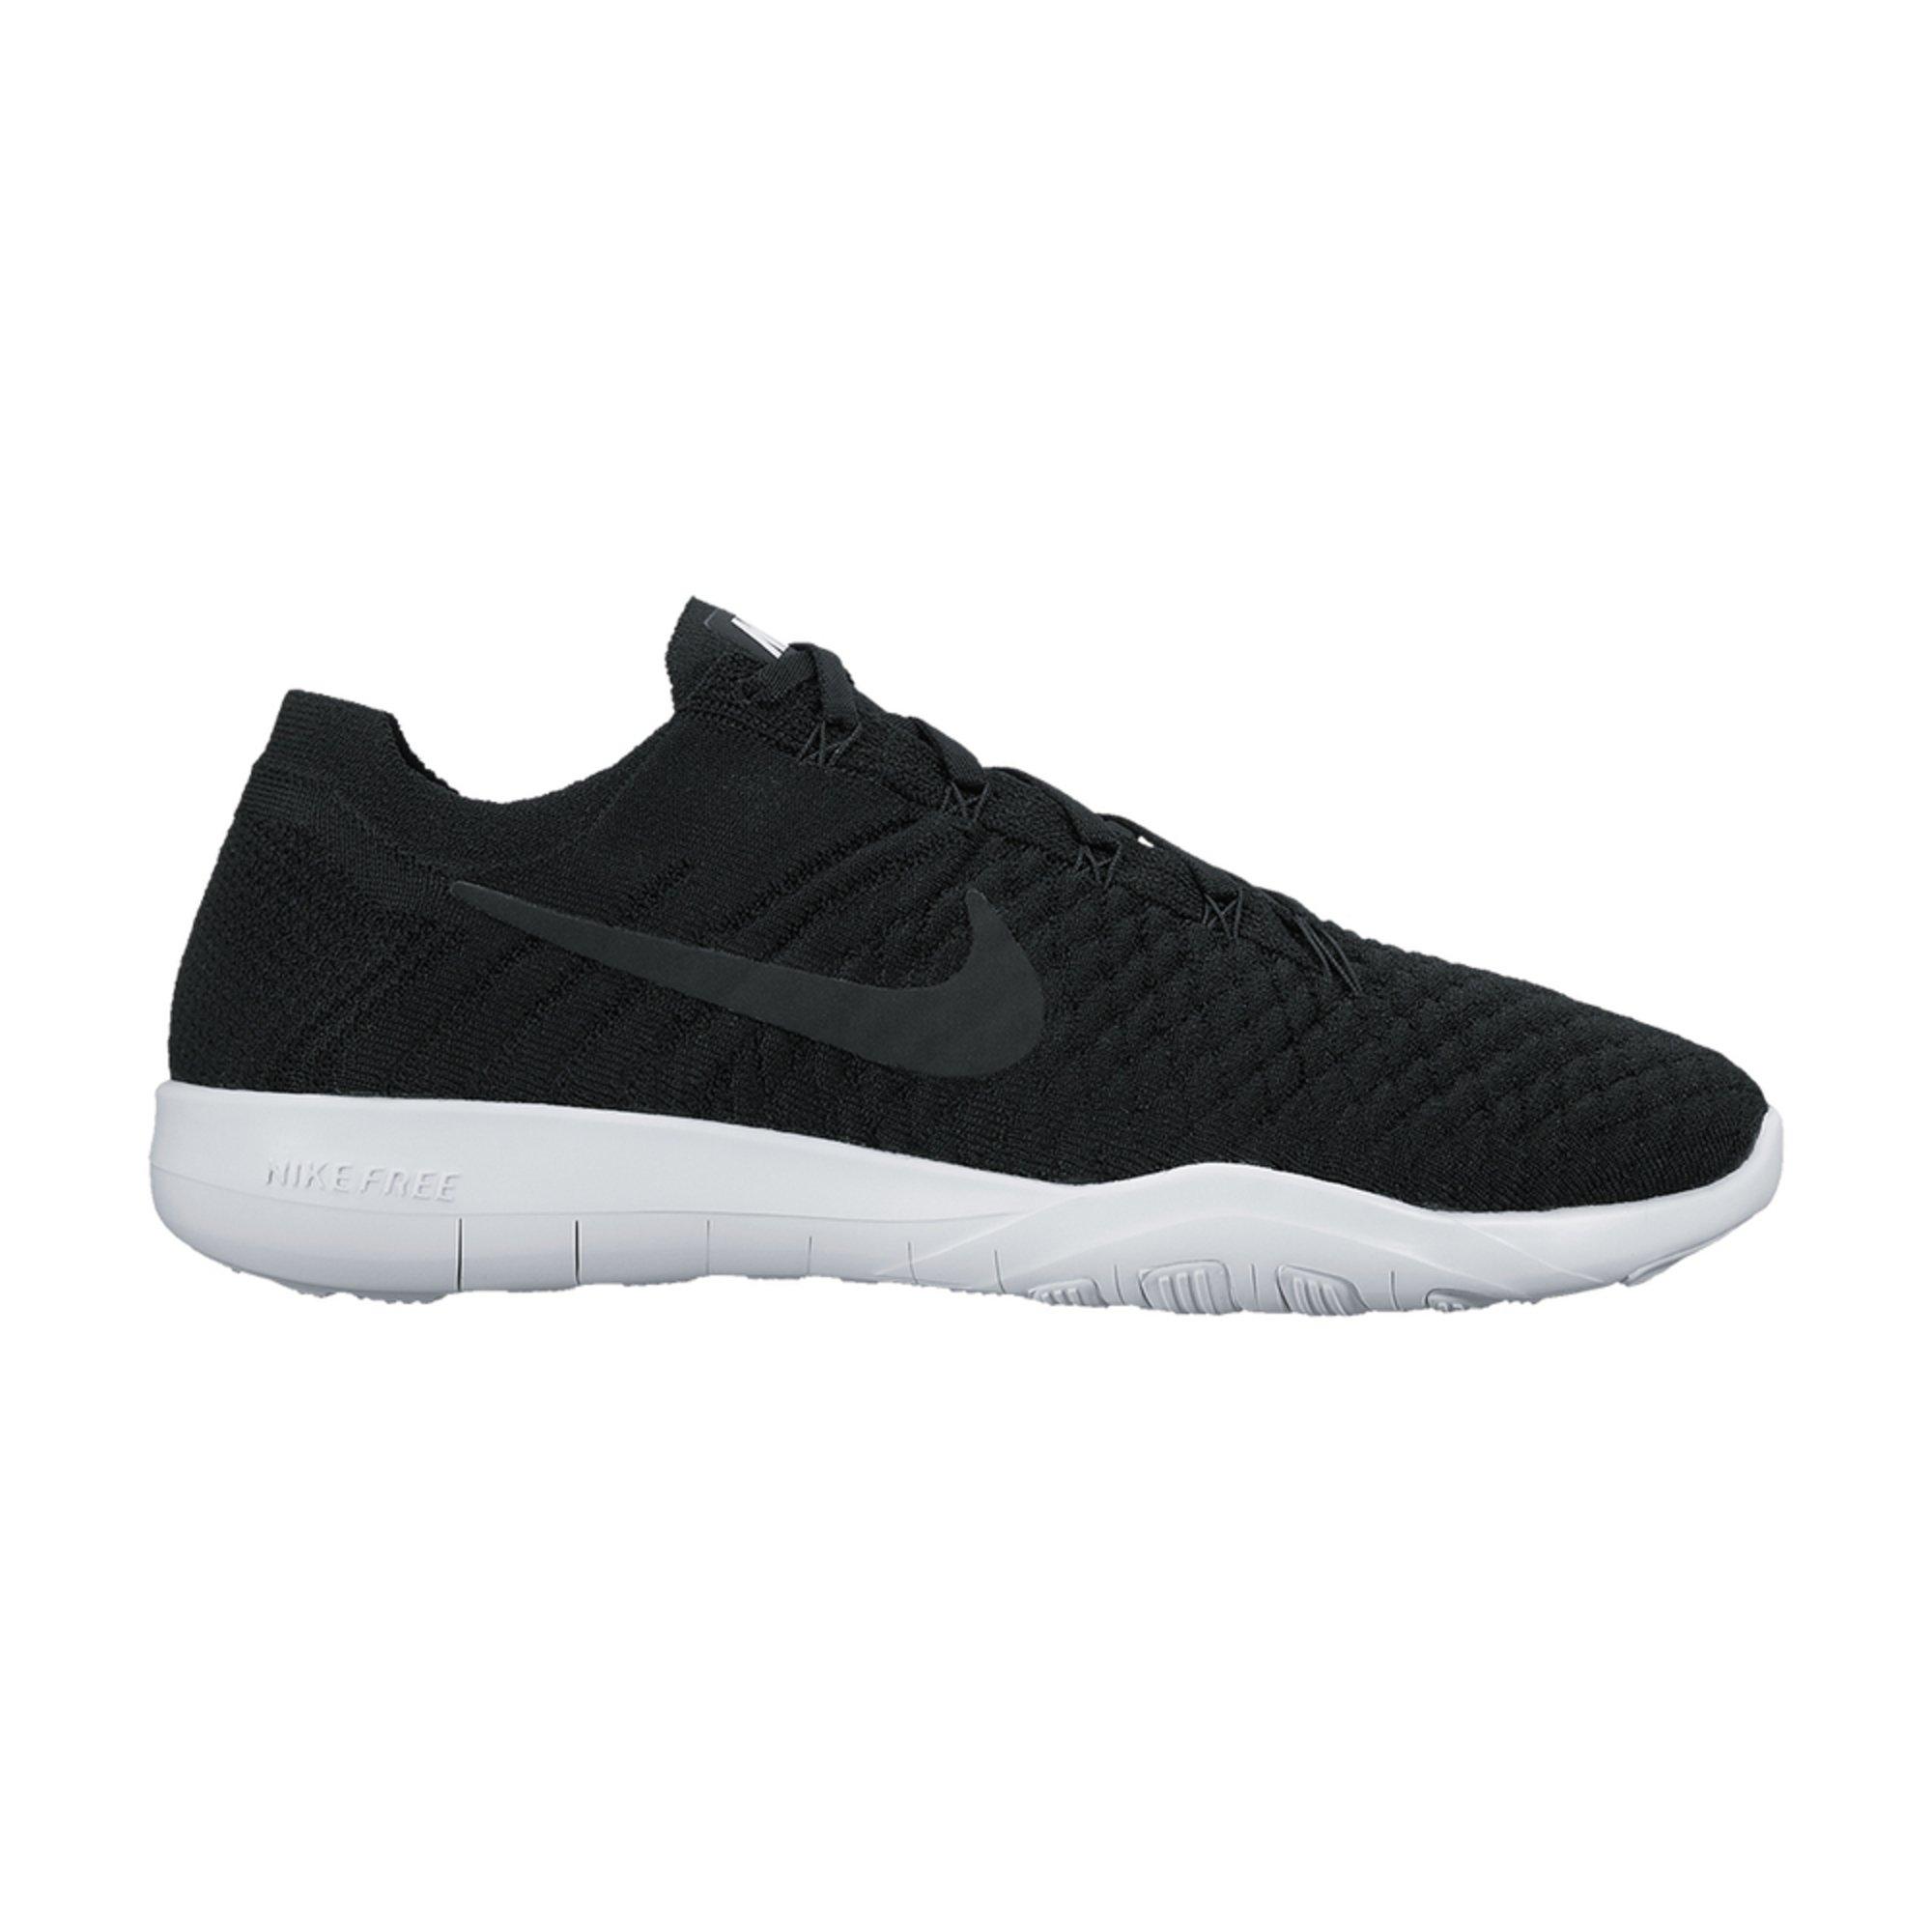 a54439f05e70 Nike. Nike Women s Free TR Flyknit 2 Training Shoe